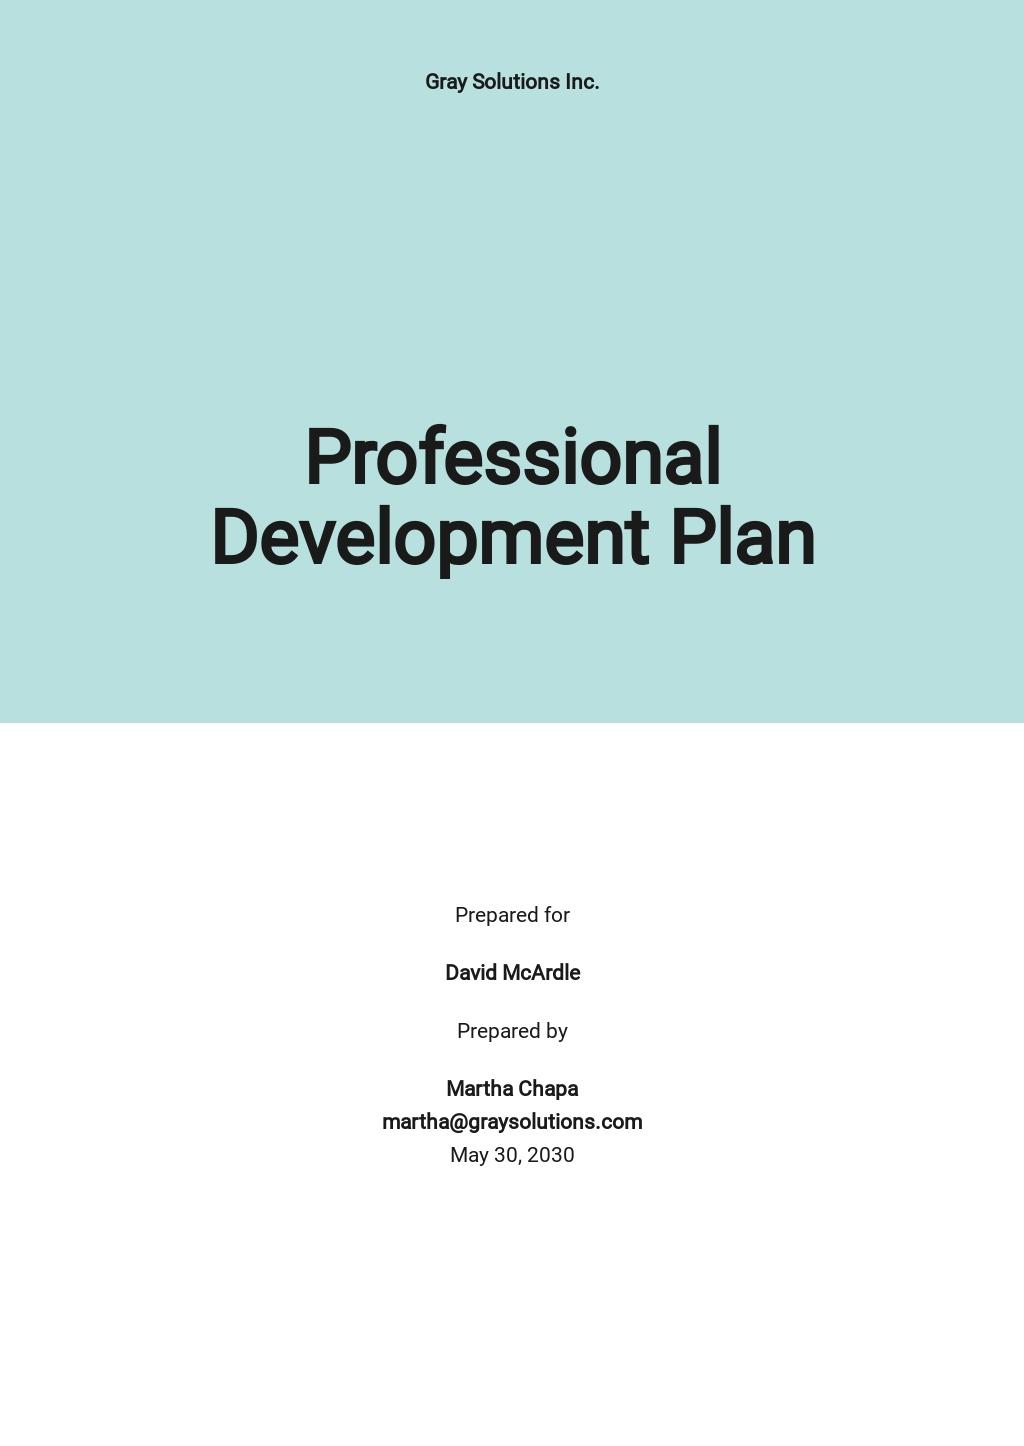 Simple Professional Development Plan Template.jpe